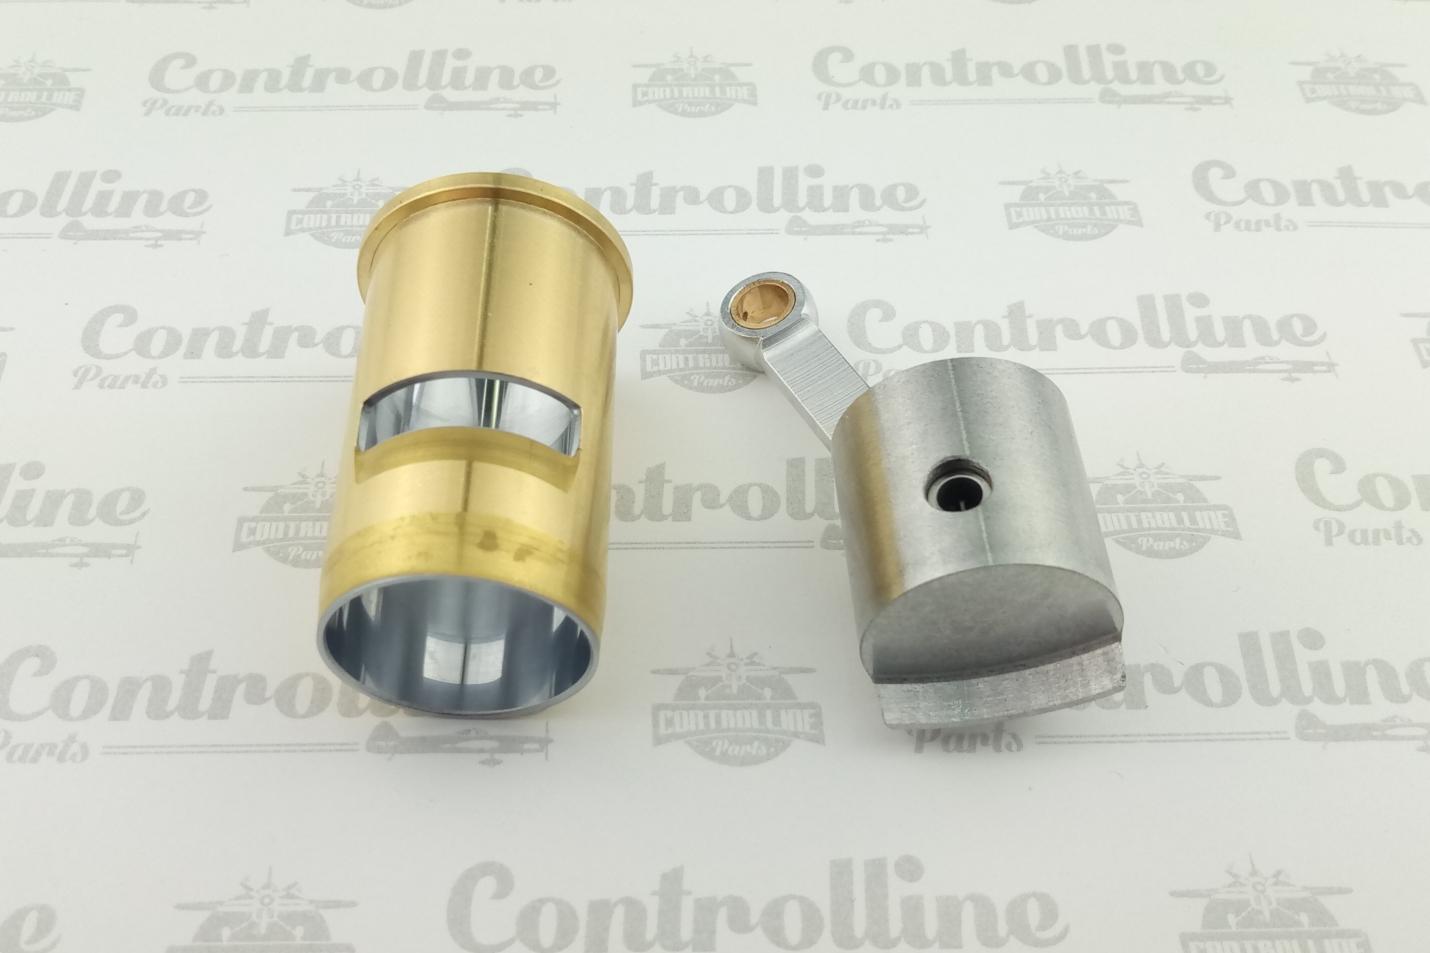 STALKER 66 / Piston, cylinder, finger and connecting rod.